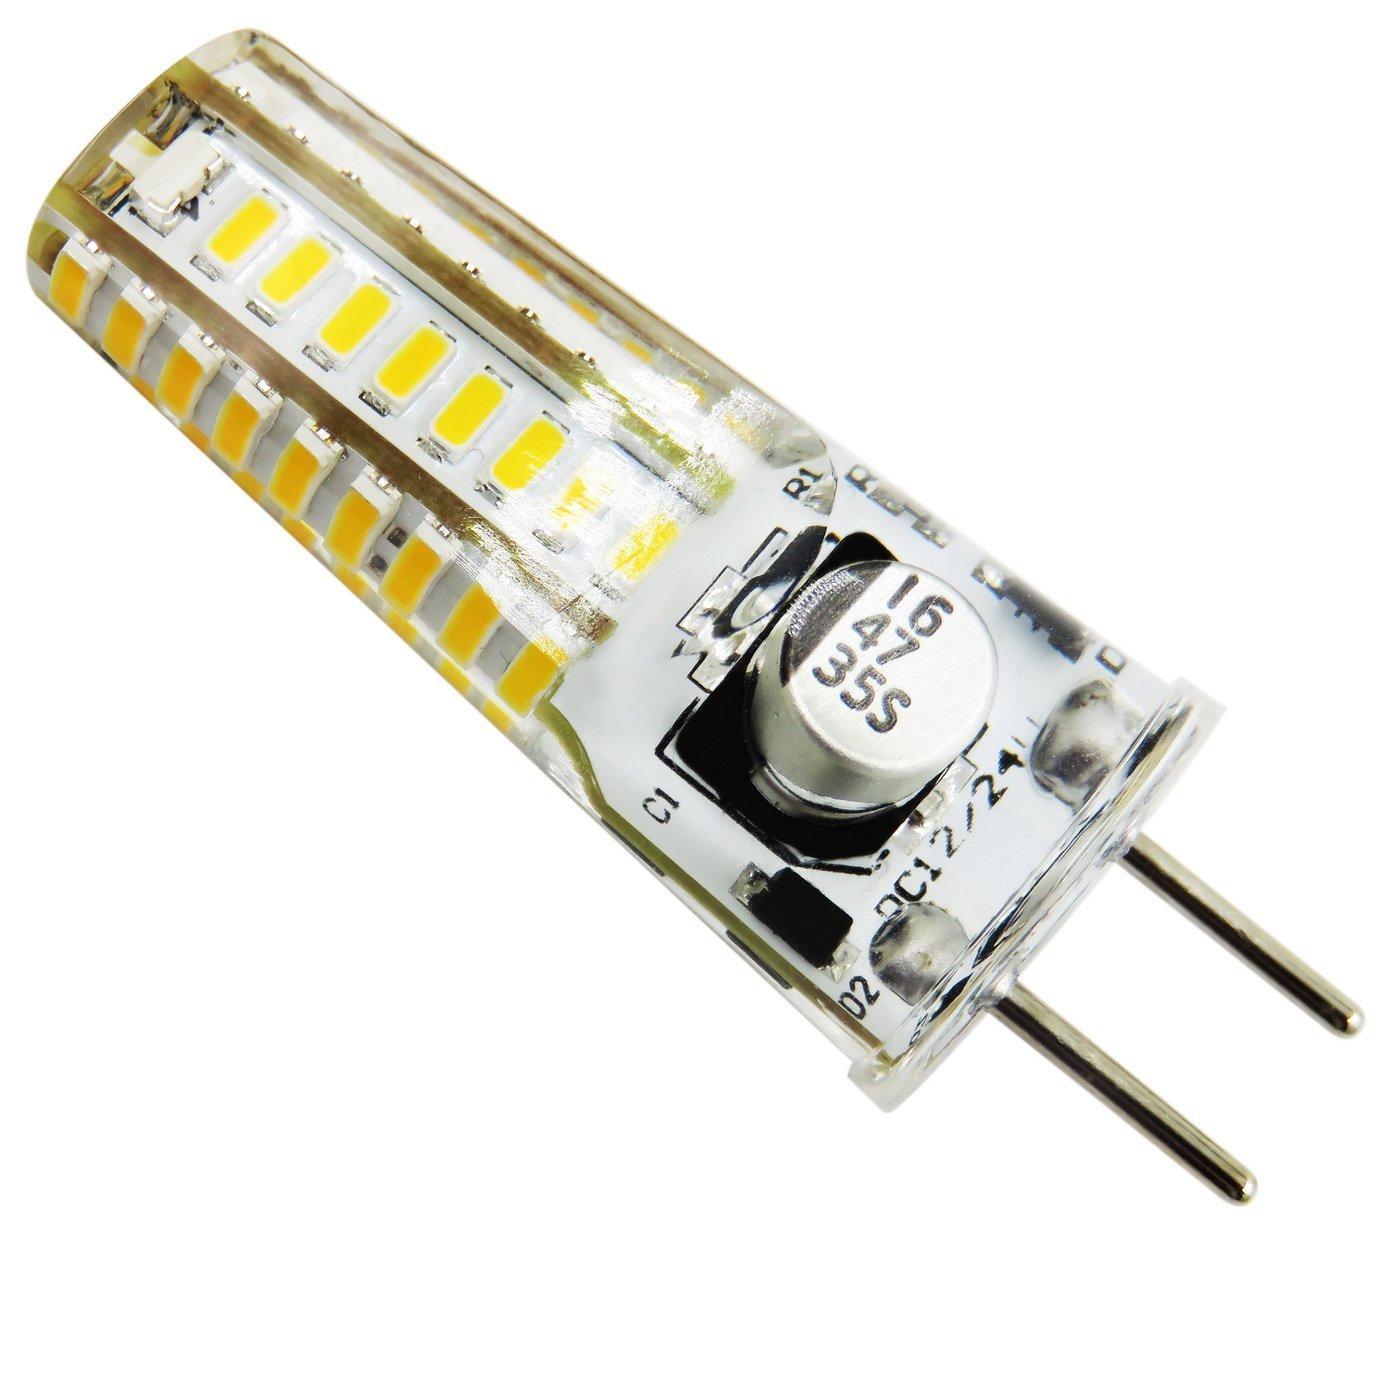 Fantastisk GY6.35GX6.35/G6.35 LED Bulb 12V 24V DC AC 1.5W 200LM 36 3014 SMD DO86